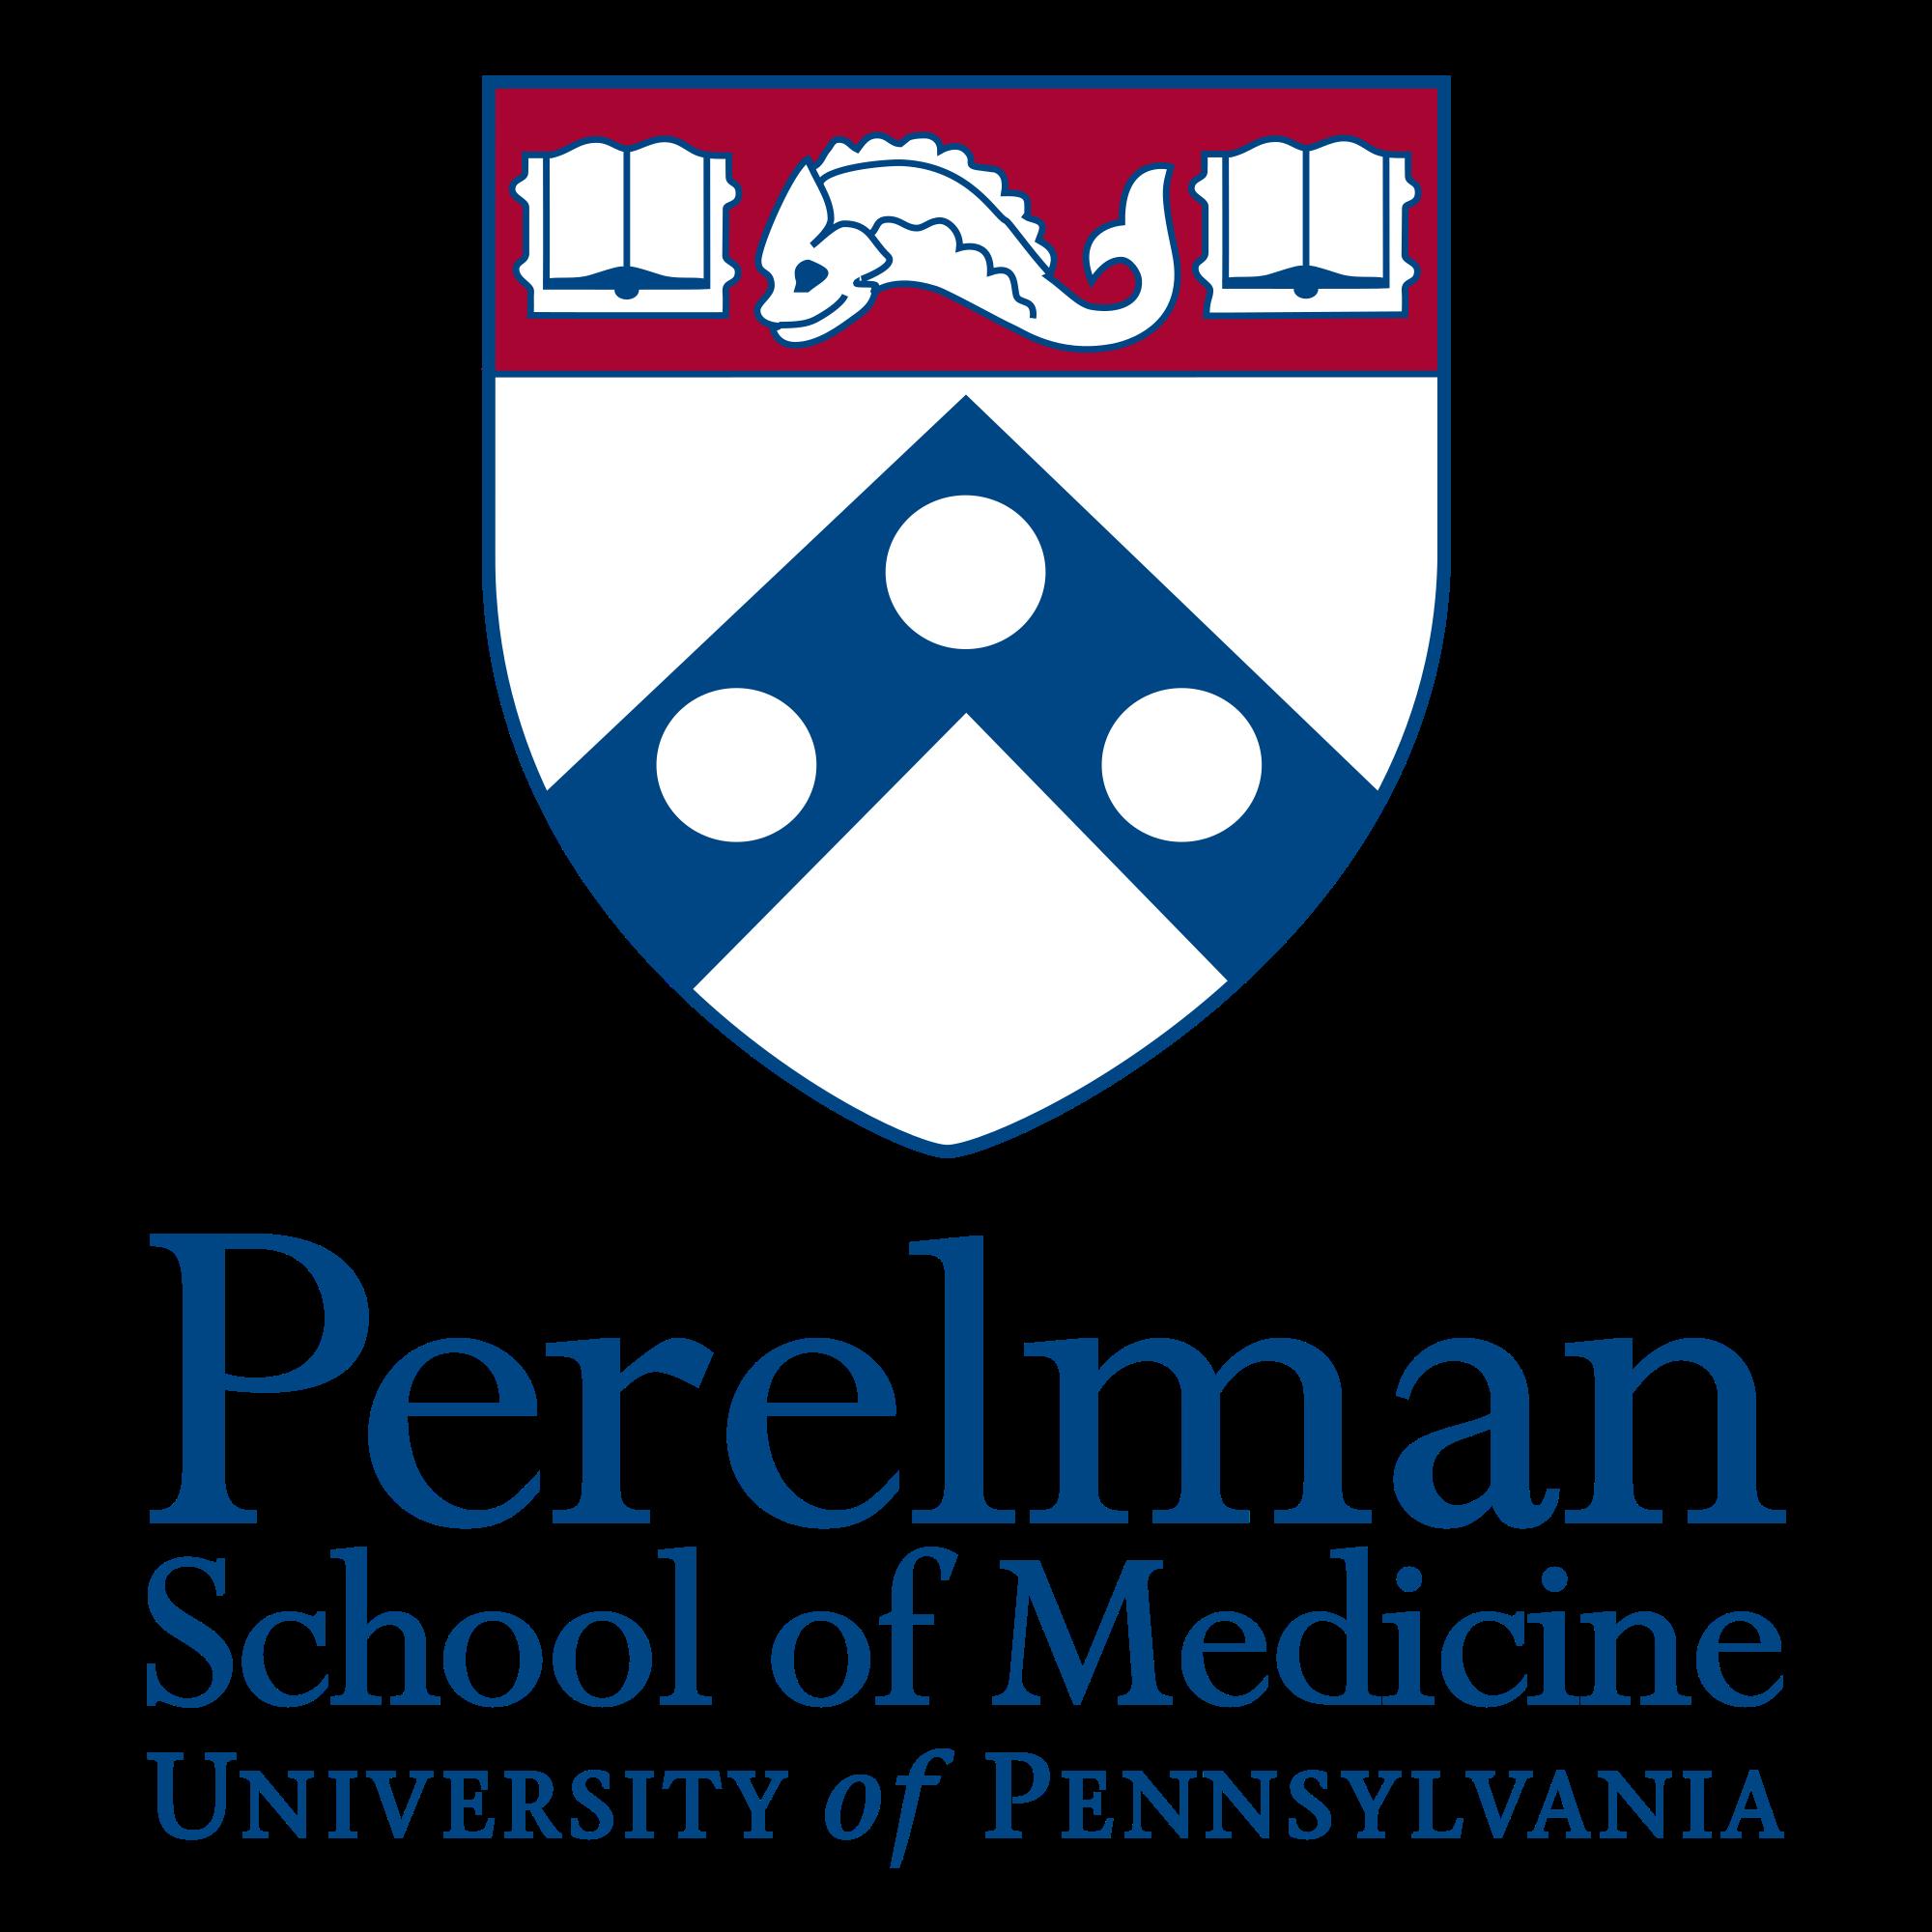 Perelman School of Medicine University of Pennsylvania